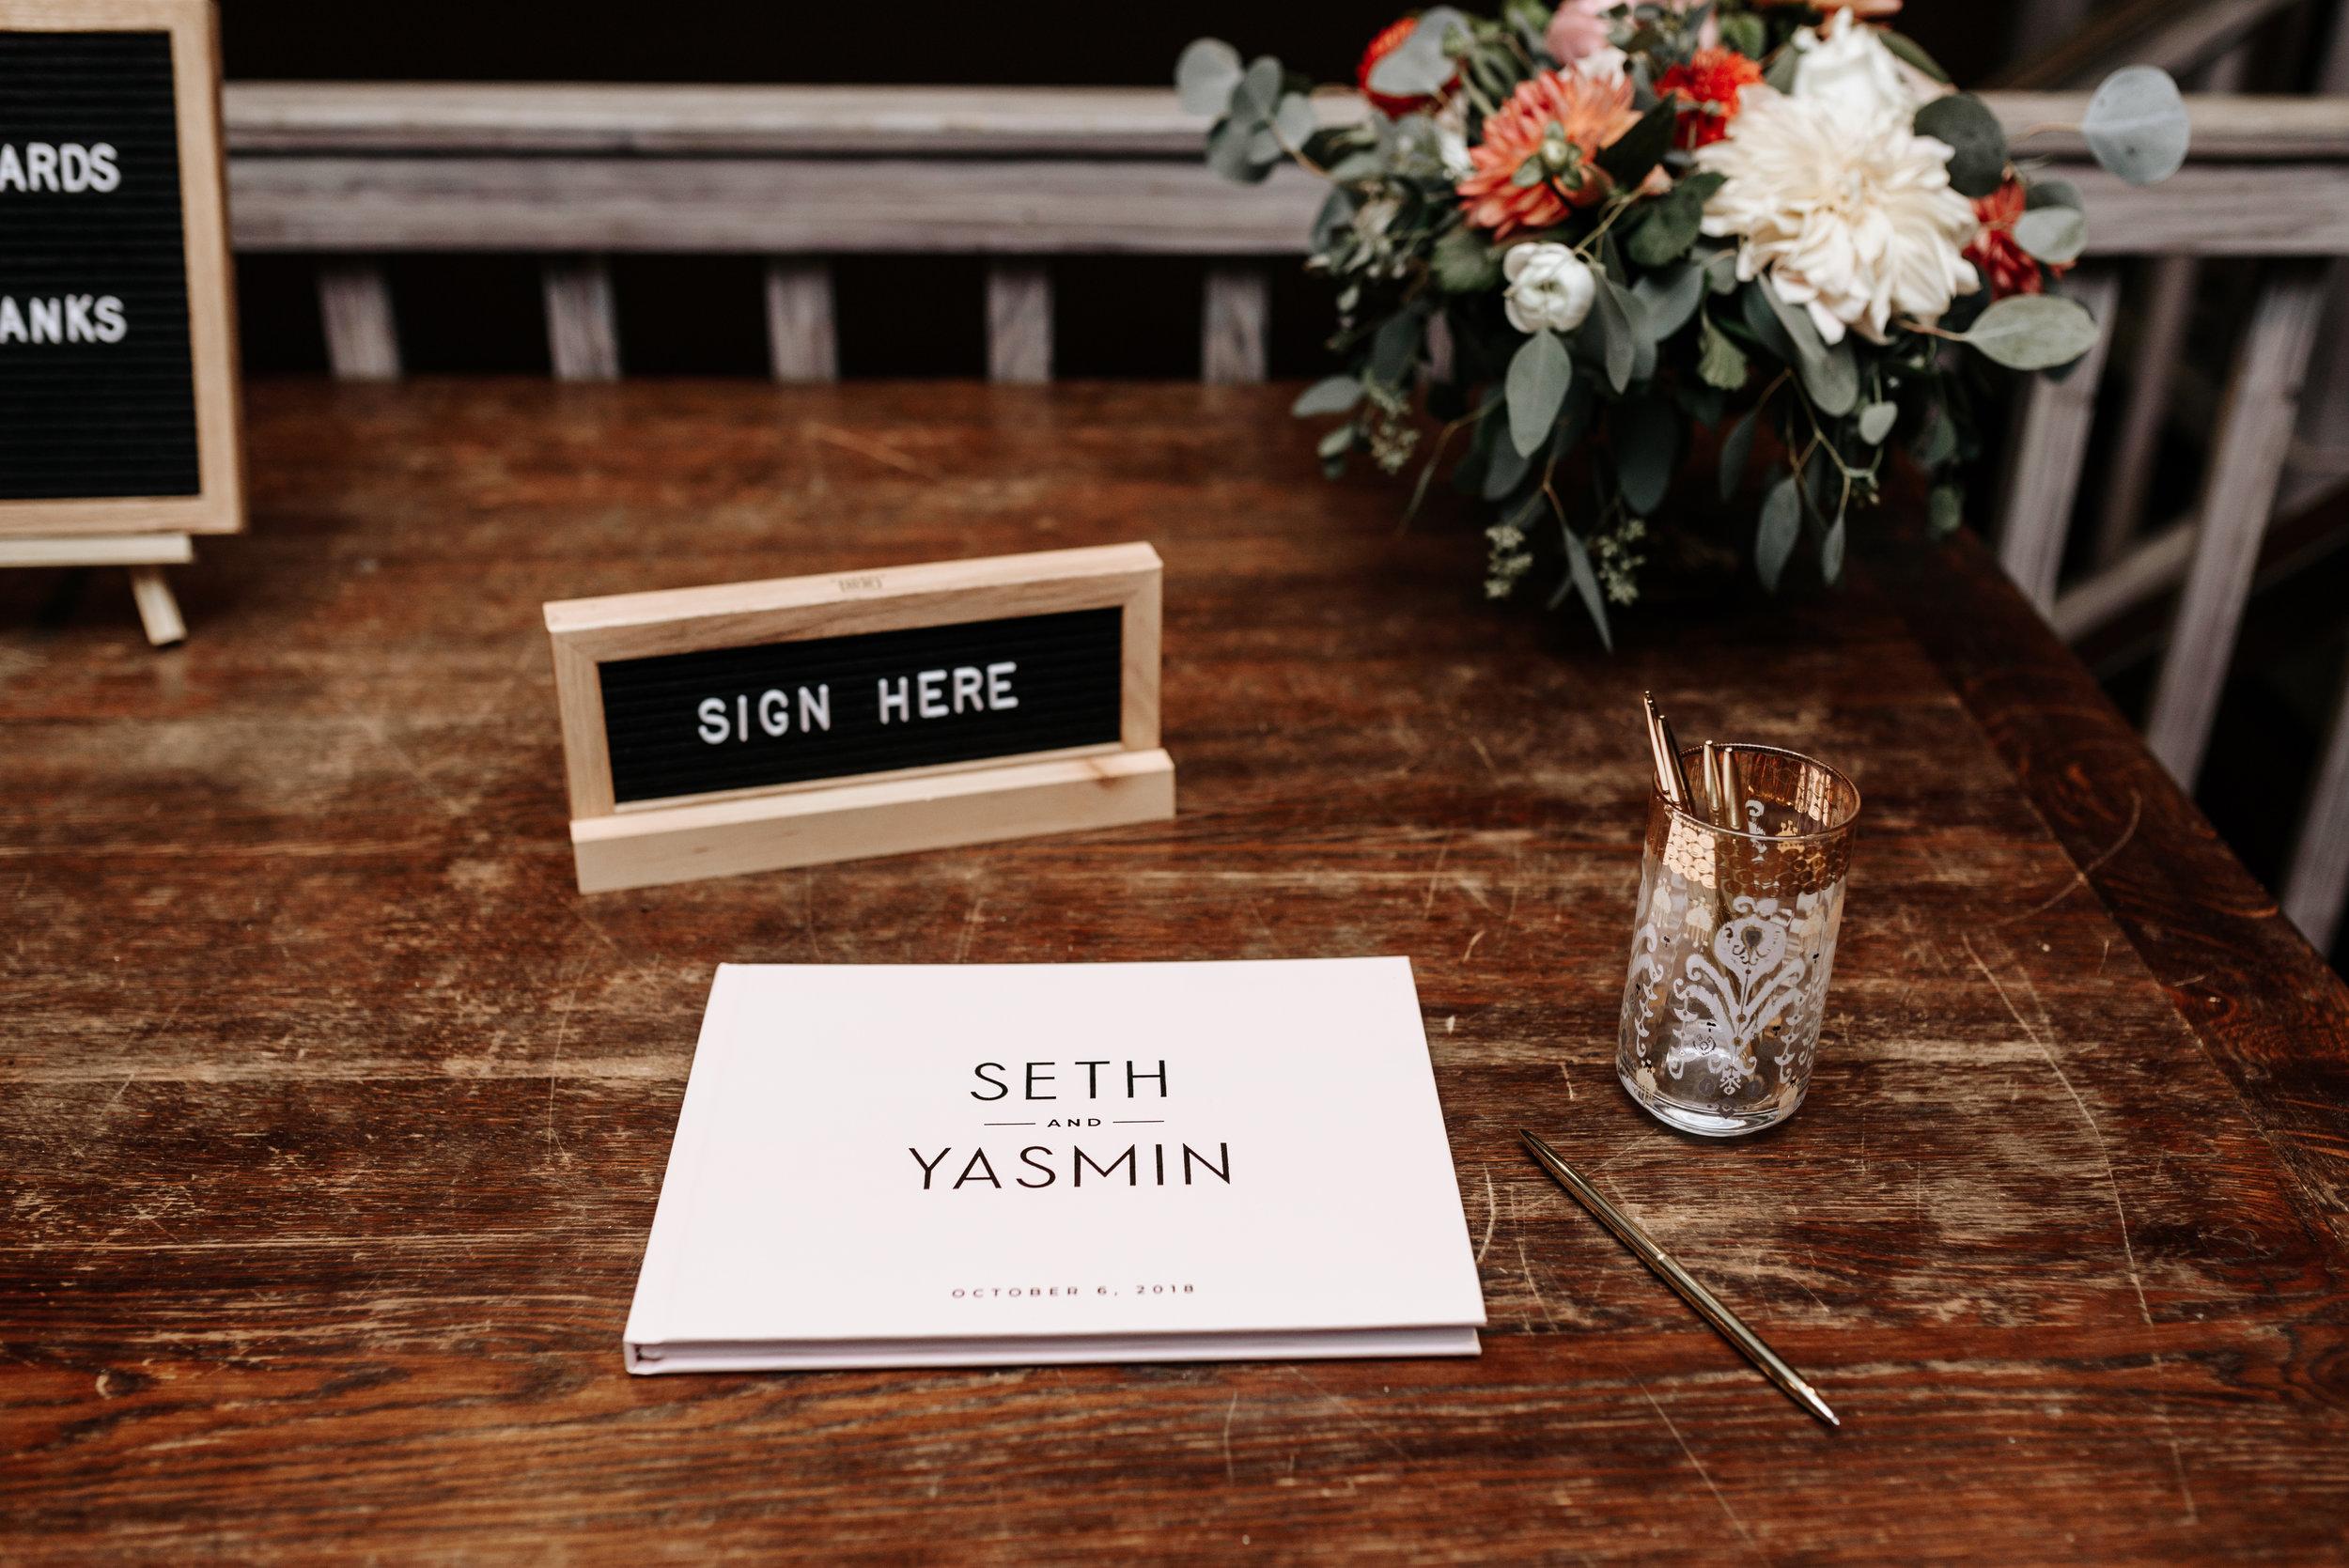 Veritas-Vineyards-and-Winery-Wedding-Photography-Afton-Virginia-Yasmin-Seth-Photography-by-V-9915.jpg